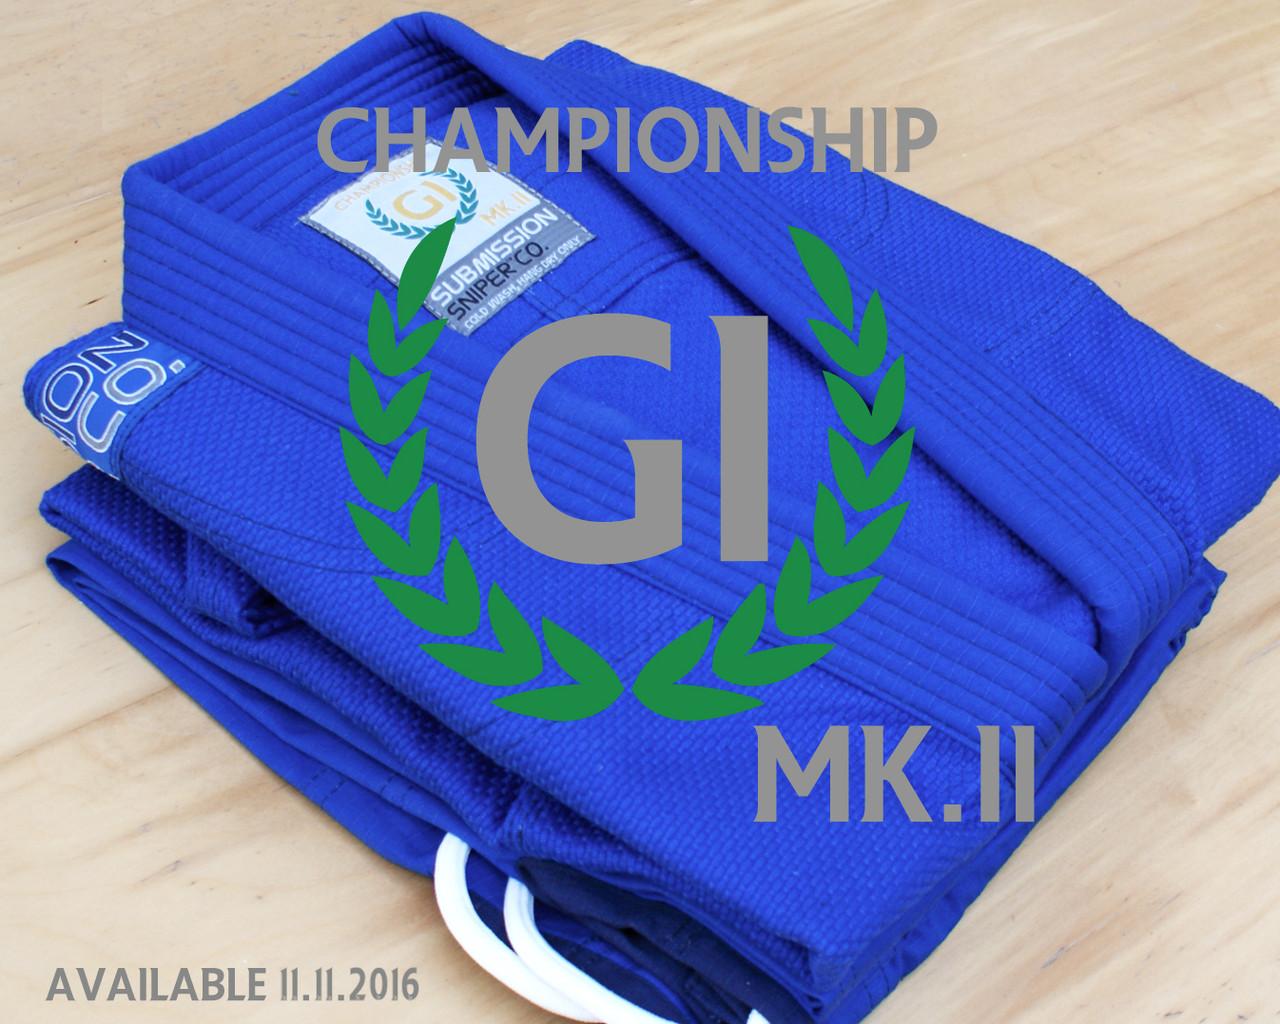 Championship PRO Standard BJJ GI